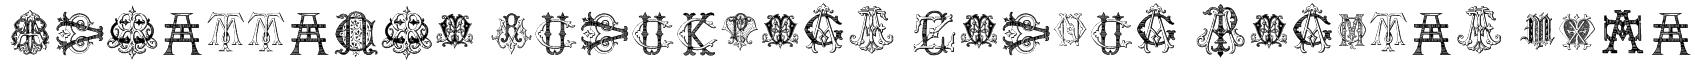 Intellecta Monograms Random Samples Five Font